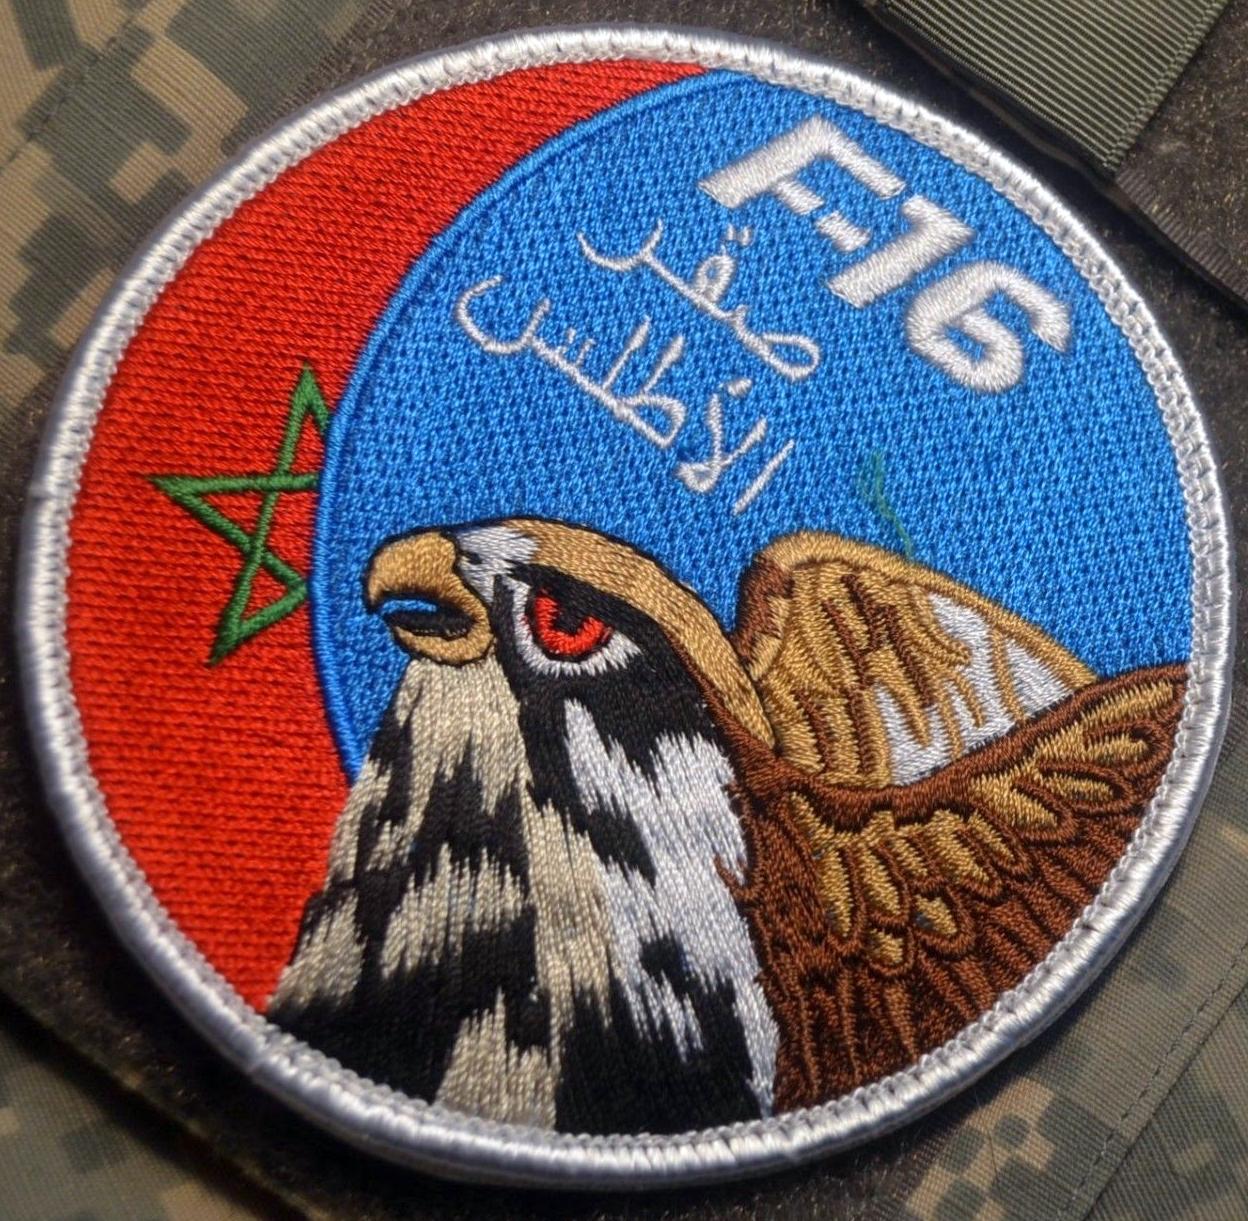 RMAF insignia Swirls Patches / Ecussons,cocardes et Insignes Des FRA - Page 5 151221091100152164